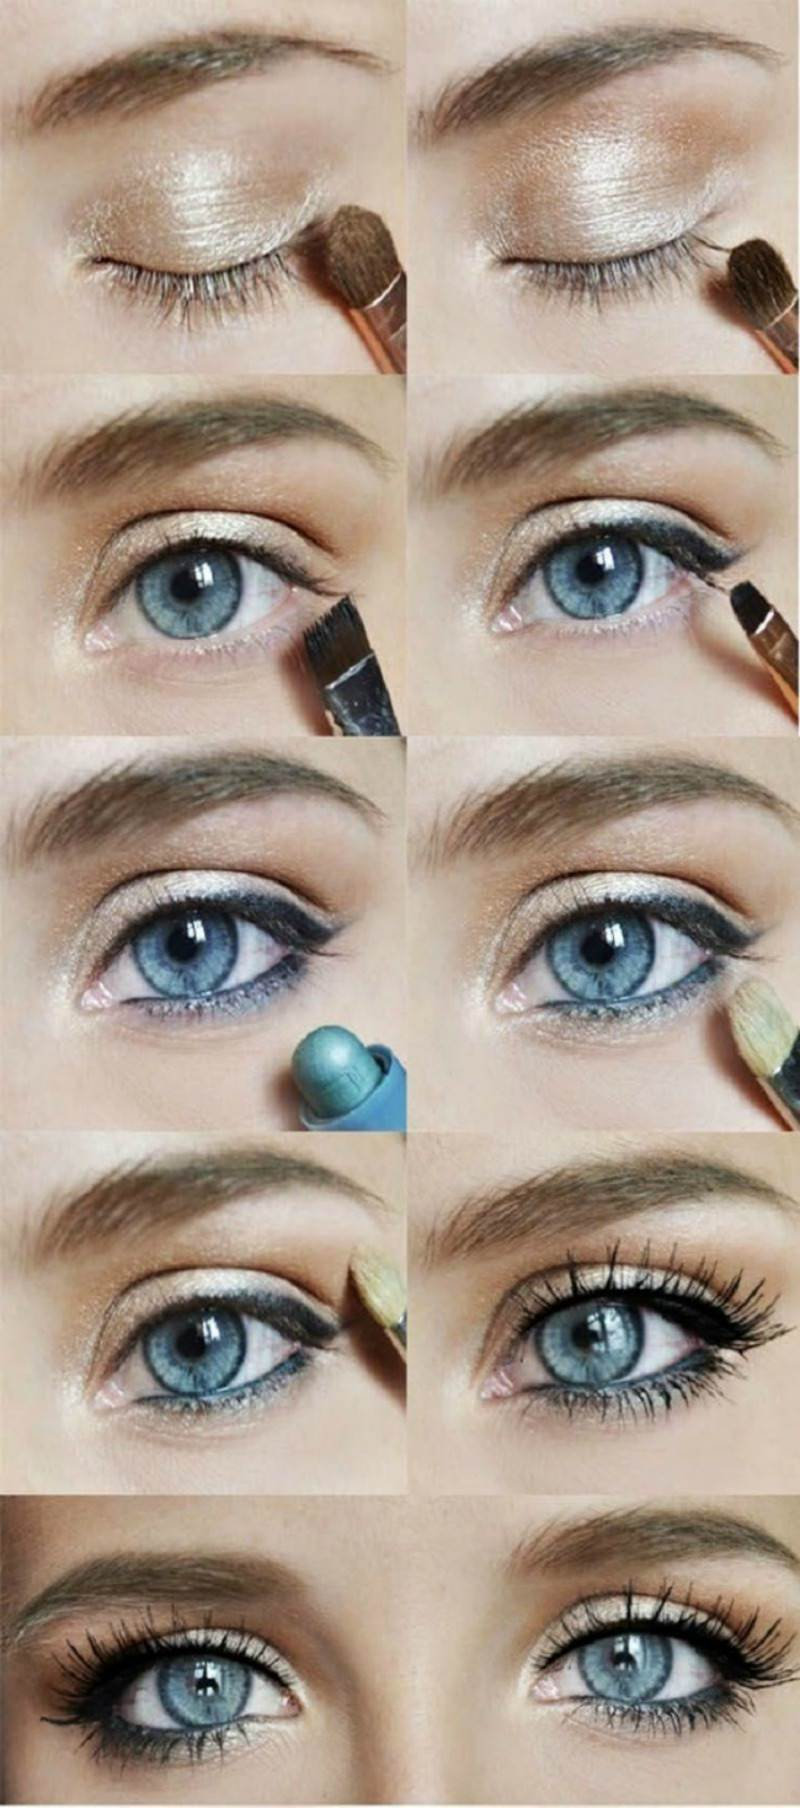 Maquillaje de ojos foto 6